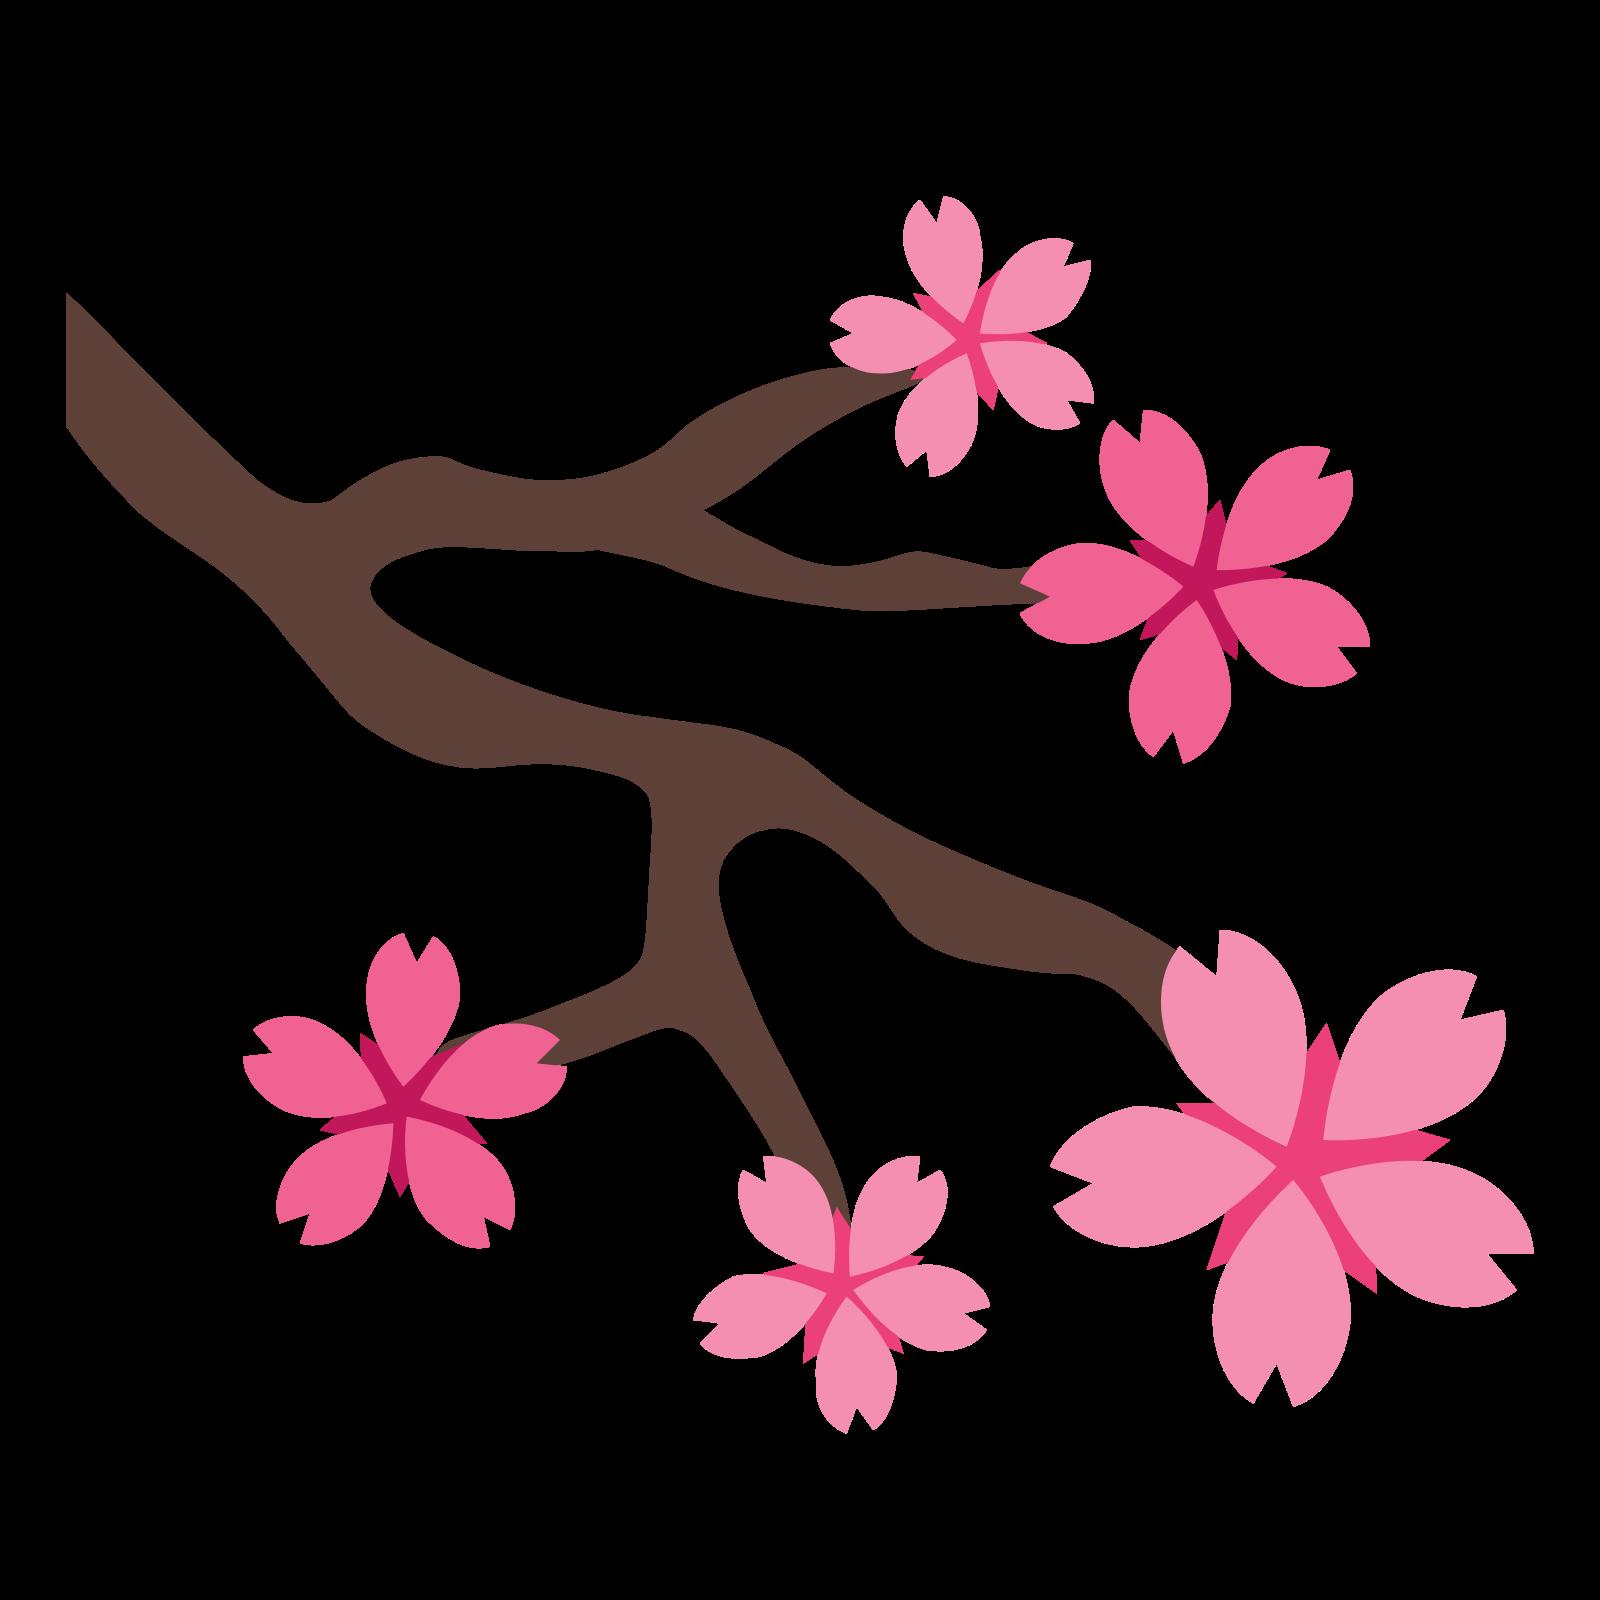 1600x1600 Cherry Blossom Clipart Transparent Tumblr